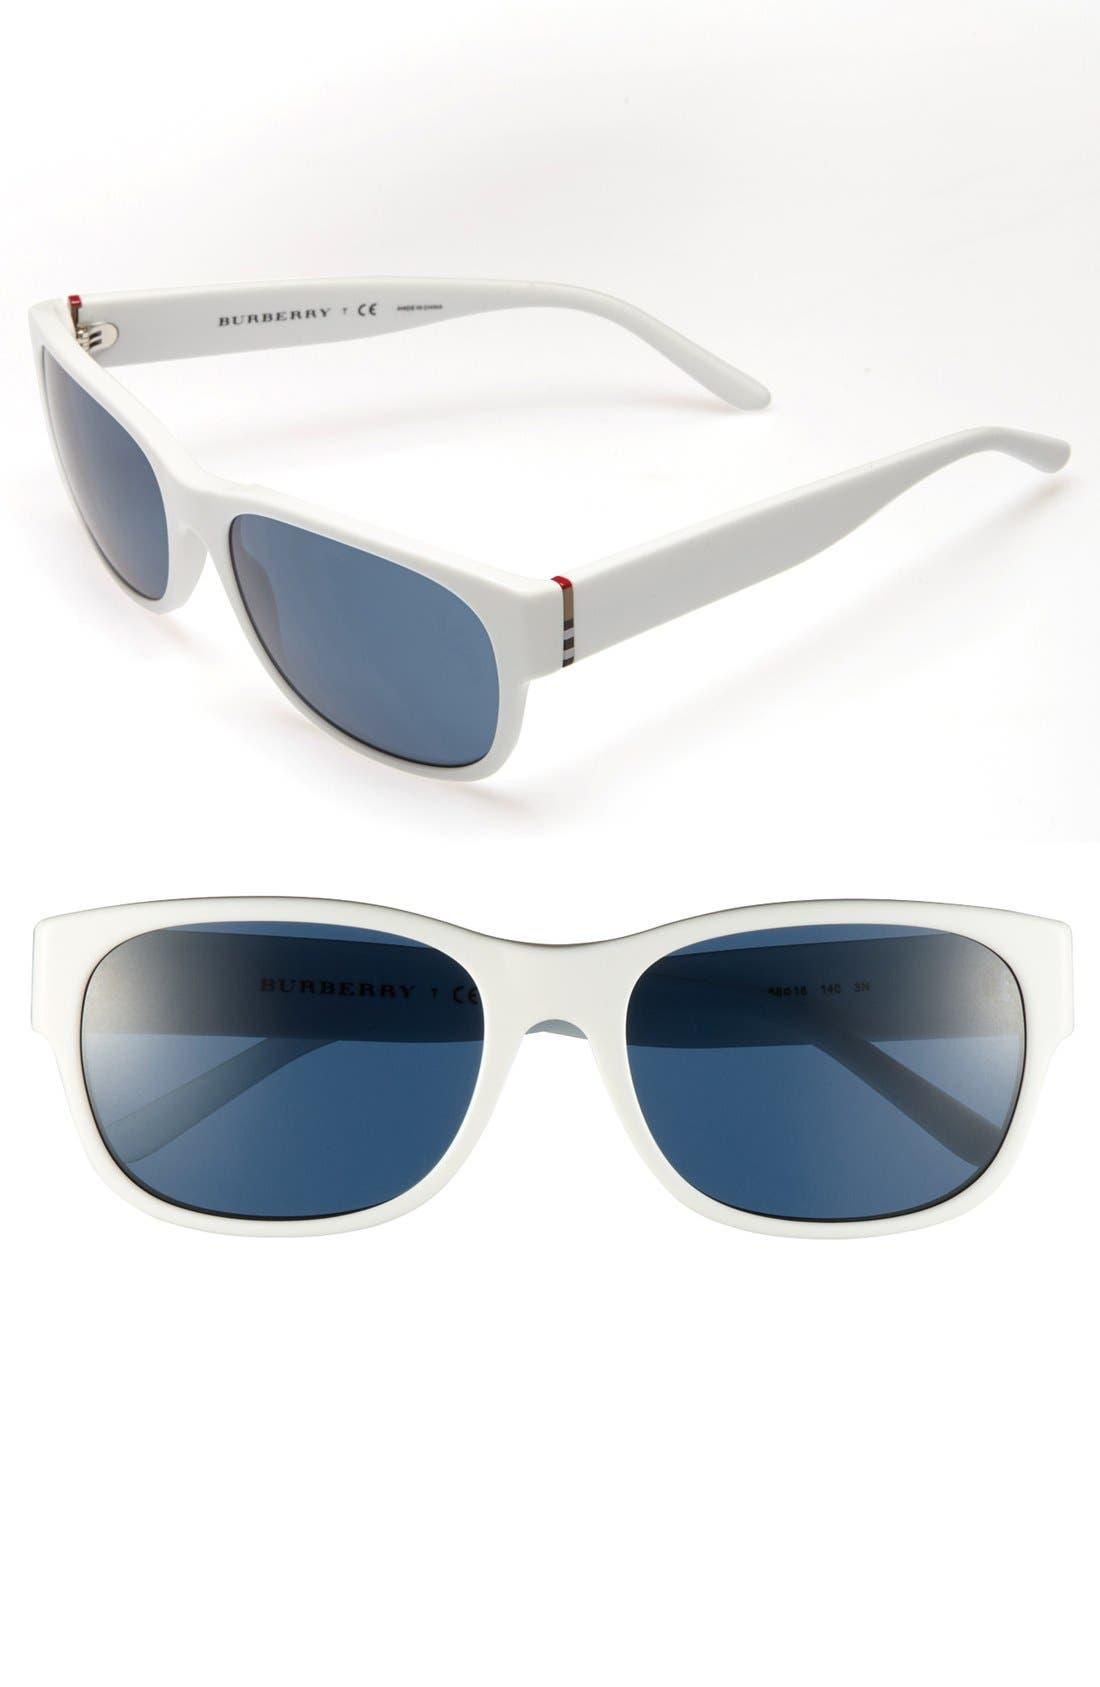 Main Image - Burberry 58mm Logo Hinge Sunglasses